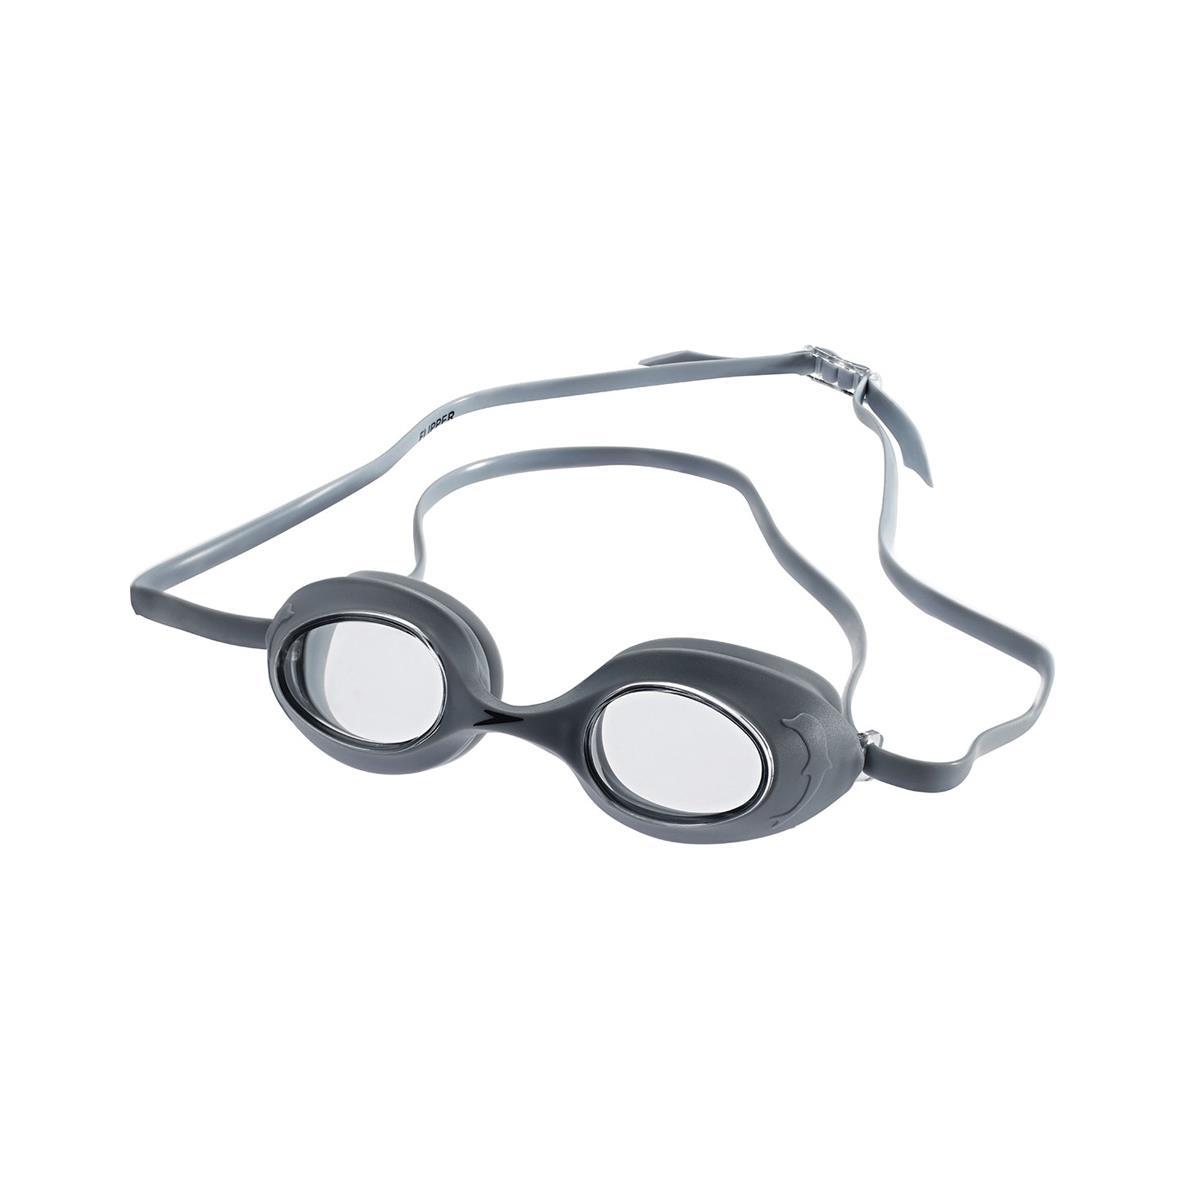 b999fc669c546 Óculos de Natação Speedo Flipper